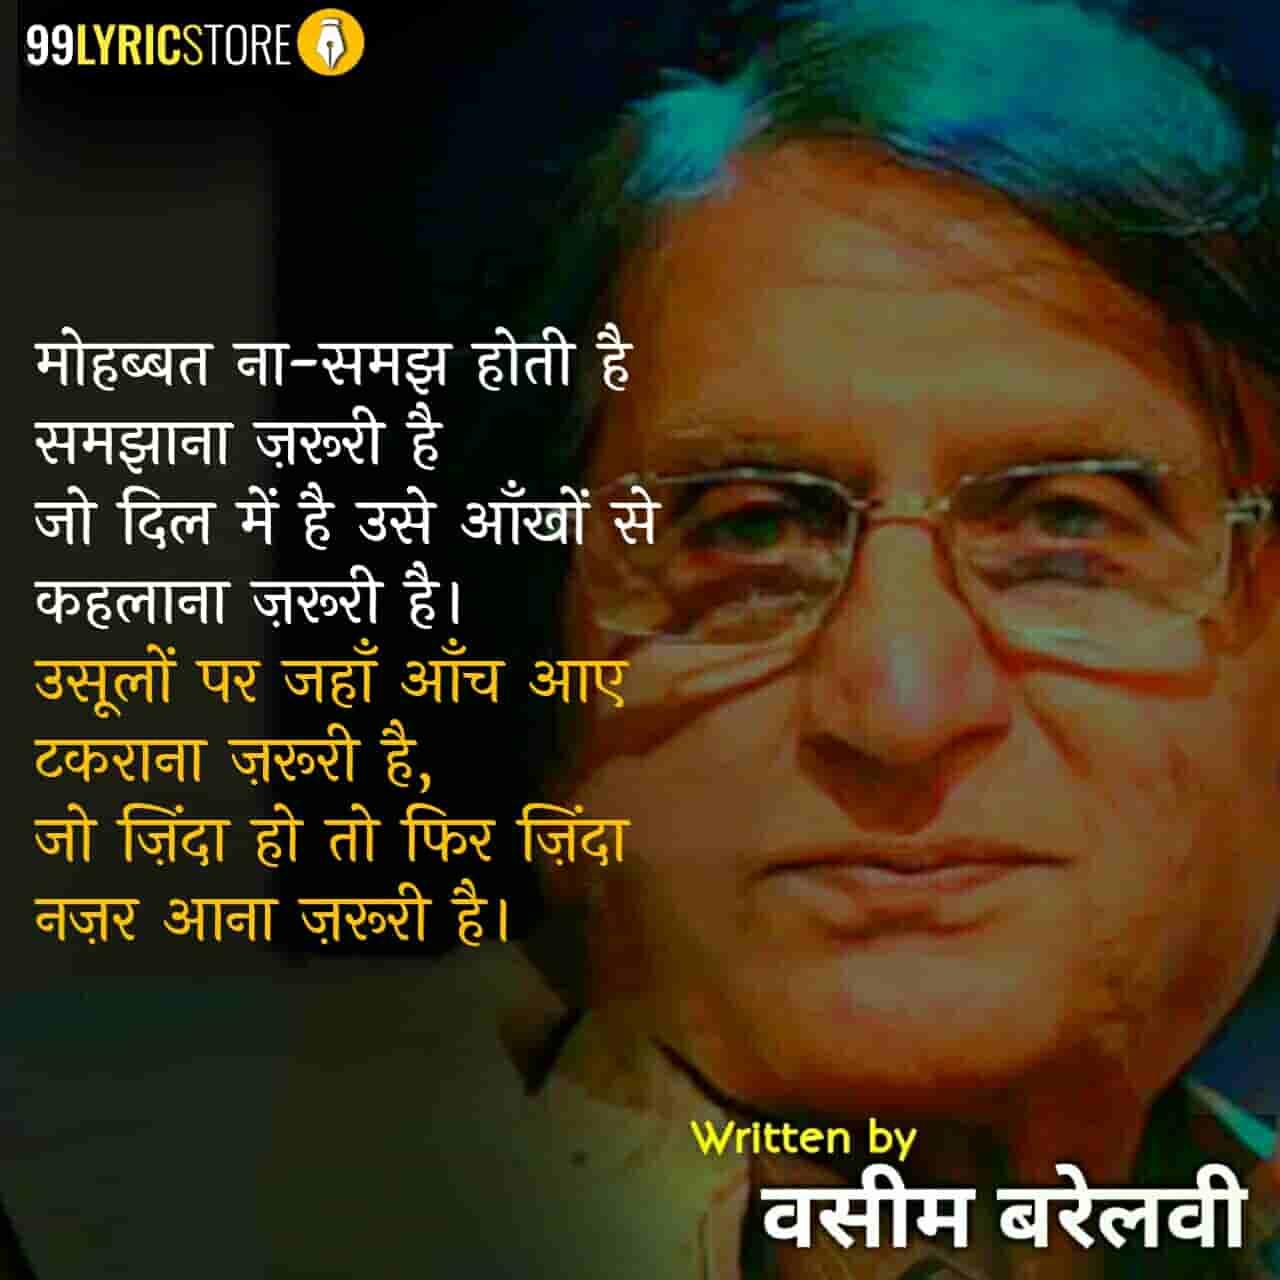 This beautiful ghazal 'Mohabbat Na-samajh Hoti Hai' has written by Waseem Barelvi.